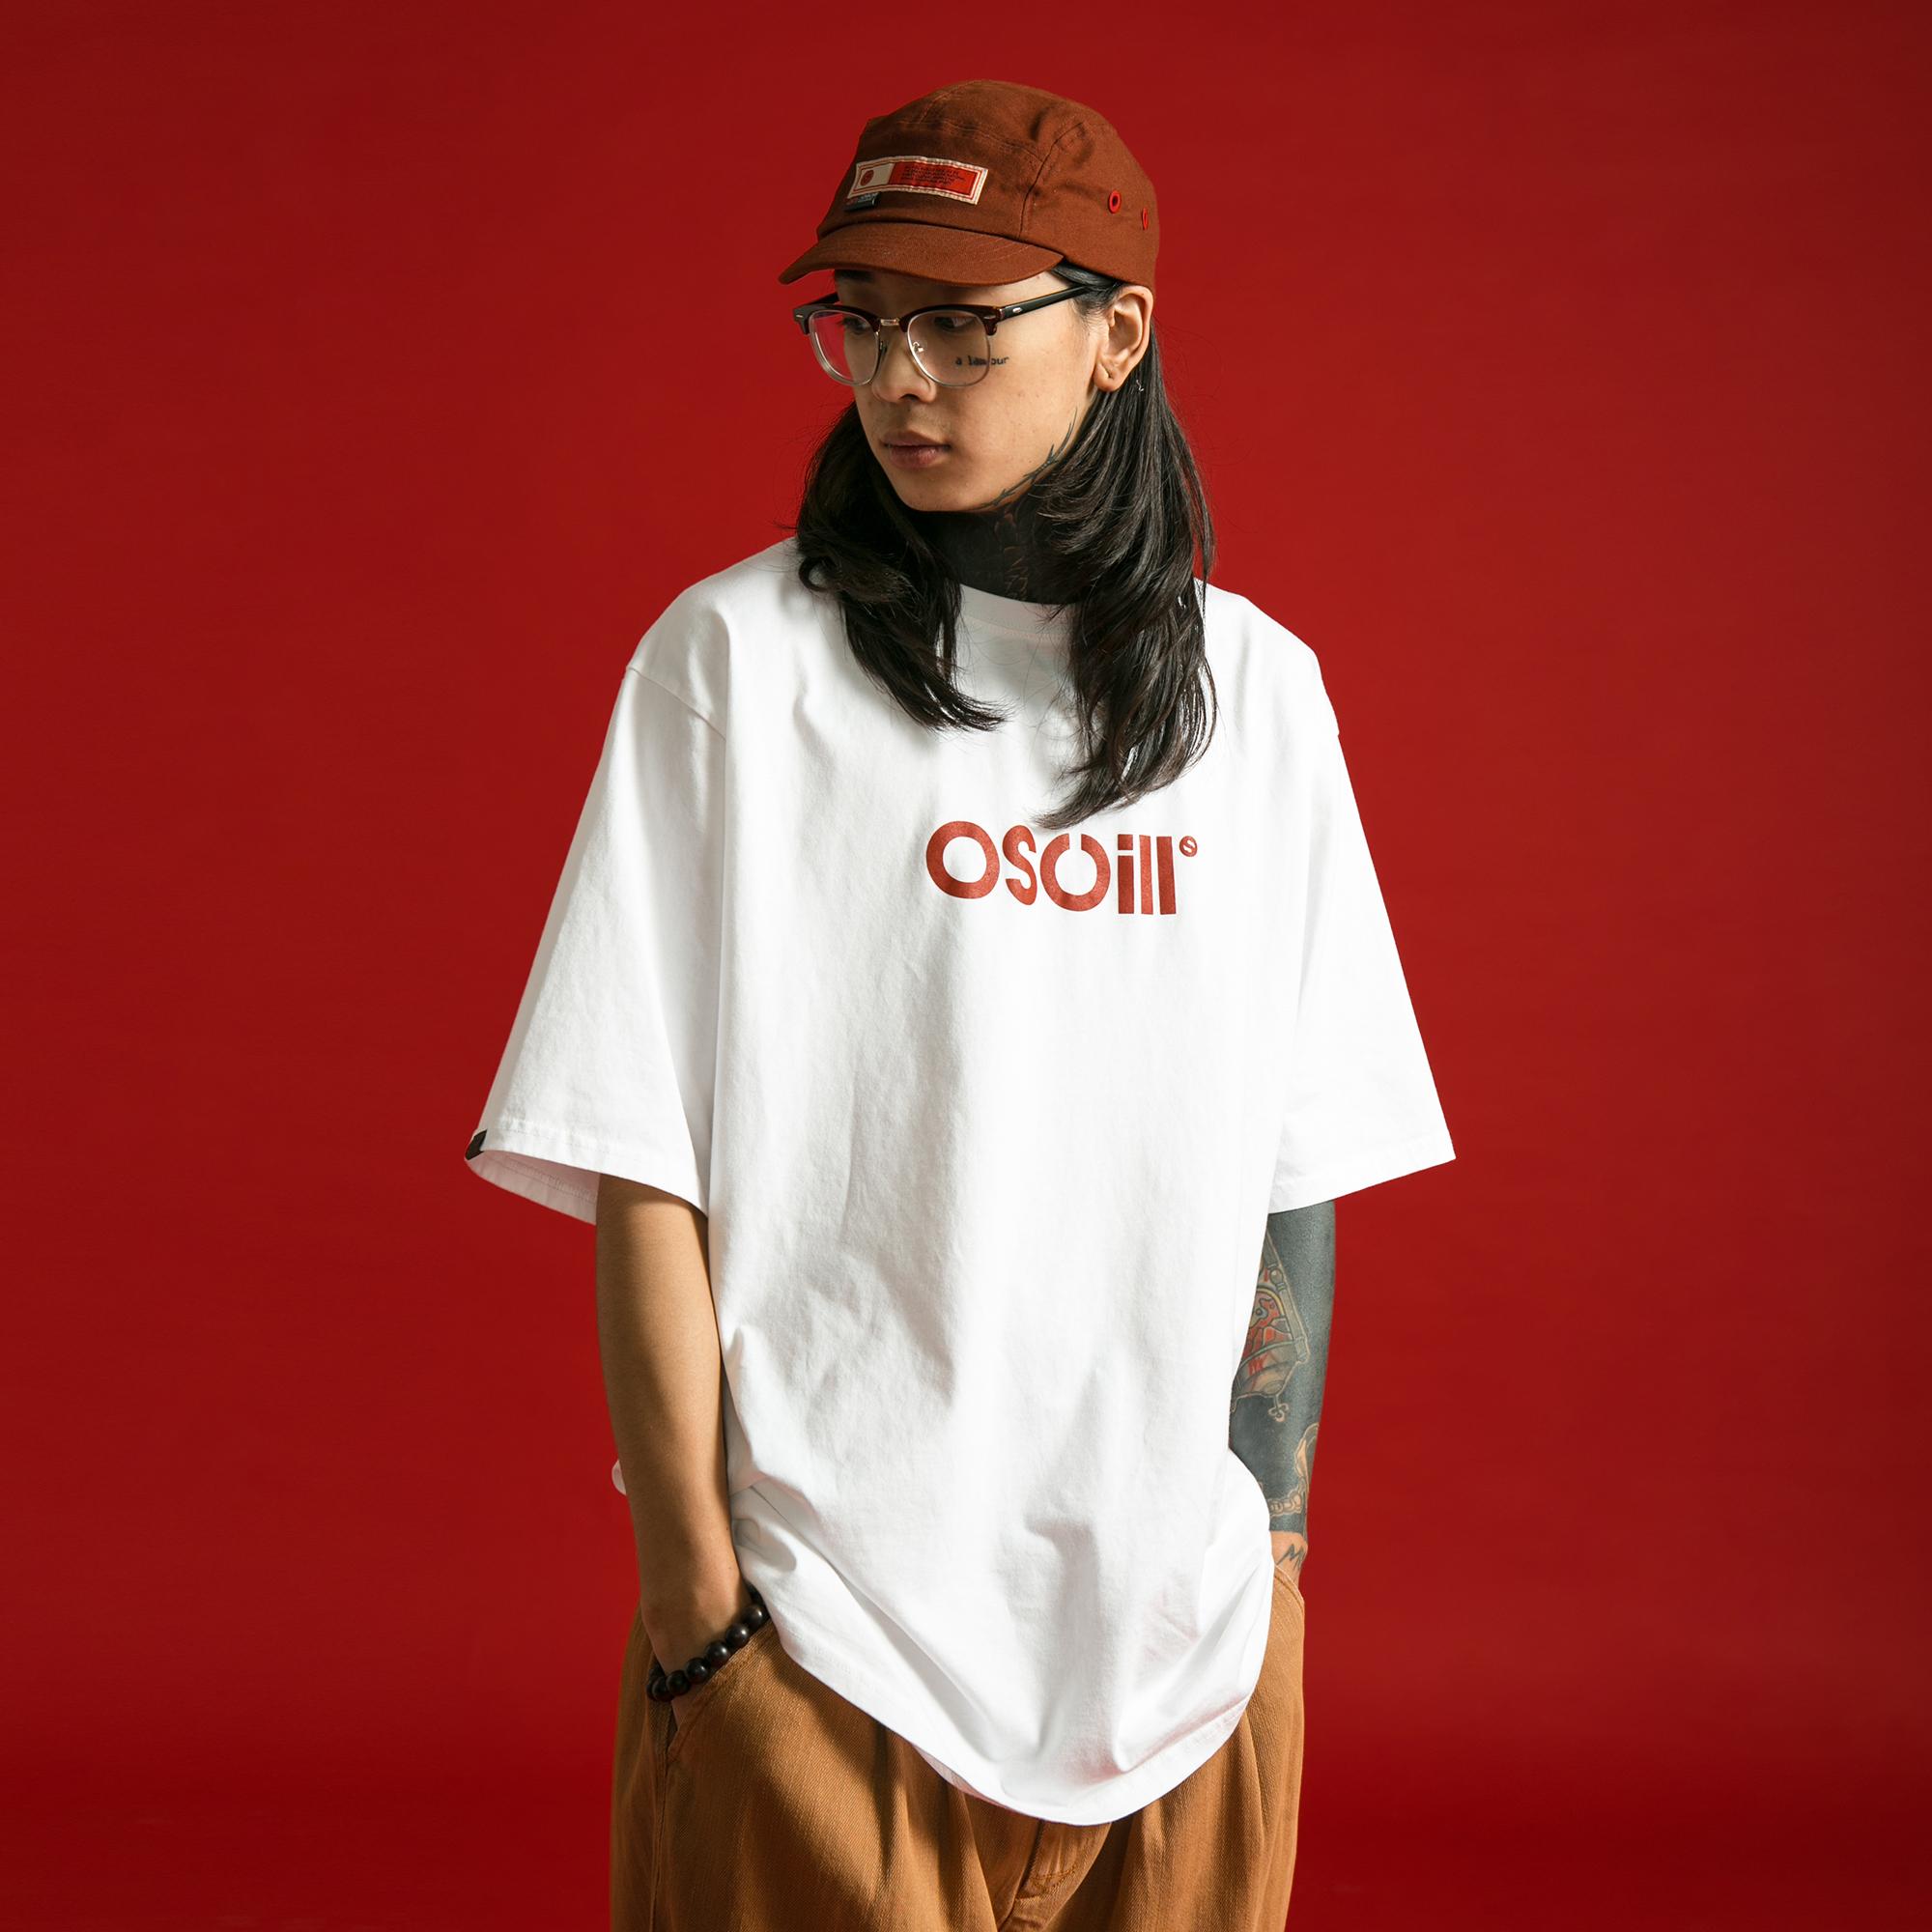 OSCill OG basic logo 元年振荡基础短袖T恤tee三色全棉